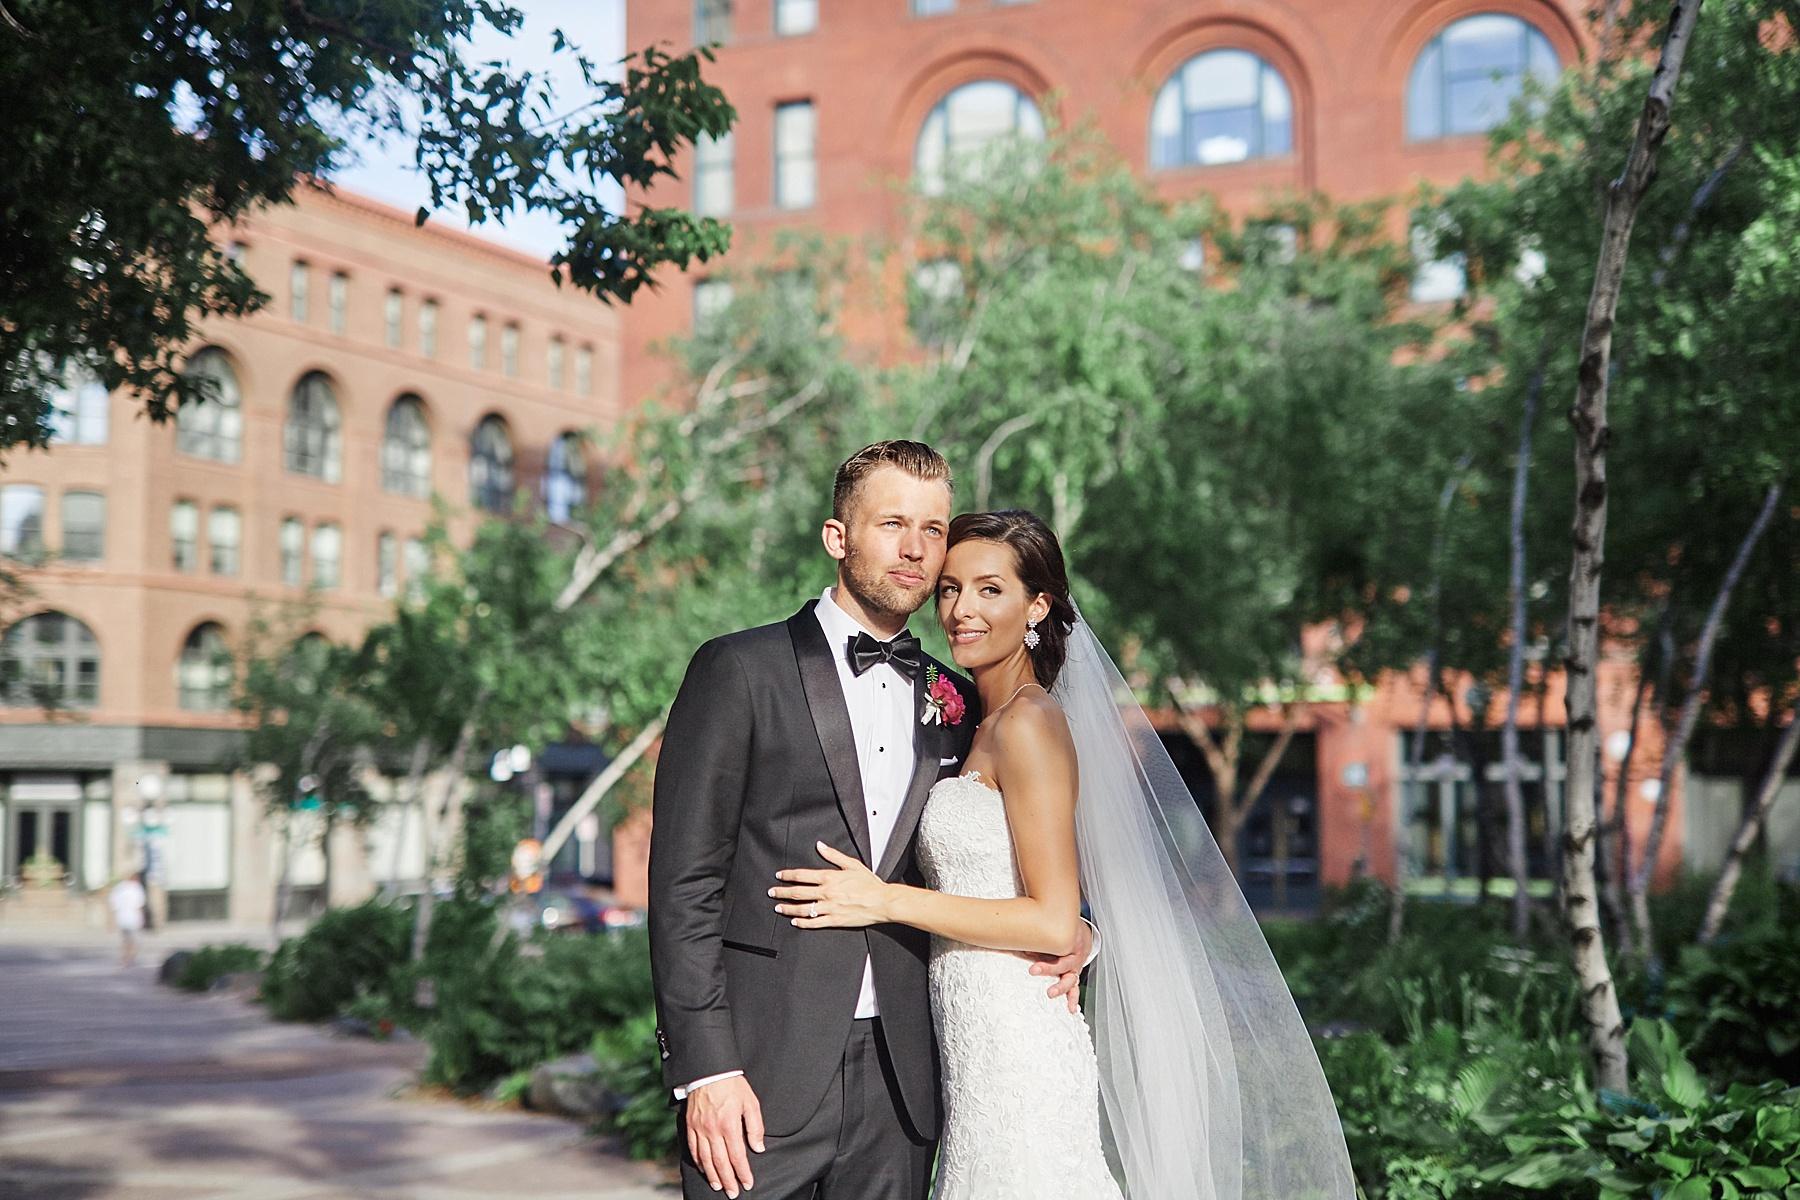 ABULAE-Wedding-Saint-paul-MN-Josh-Sofia-Wedding-Mears-Park_0803.jpg